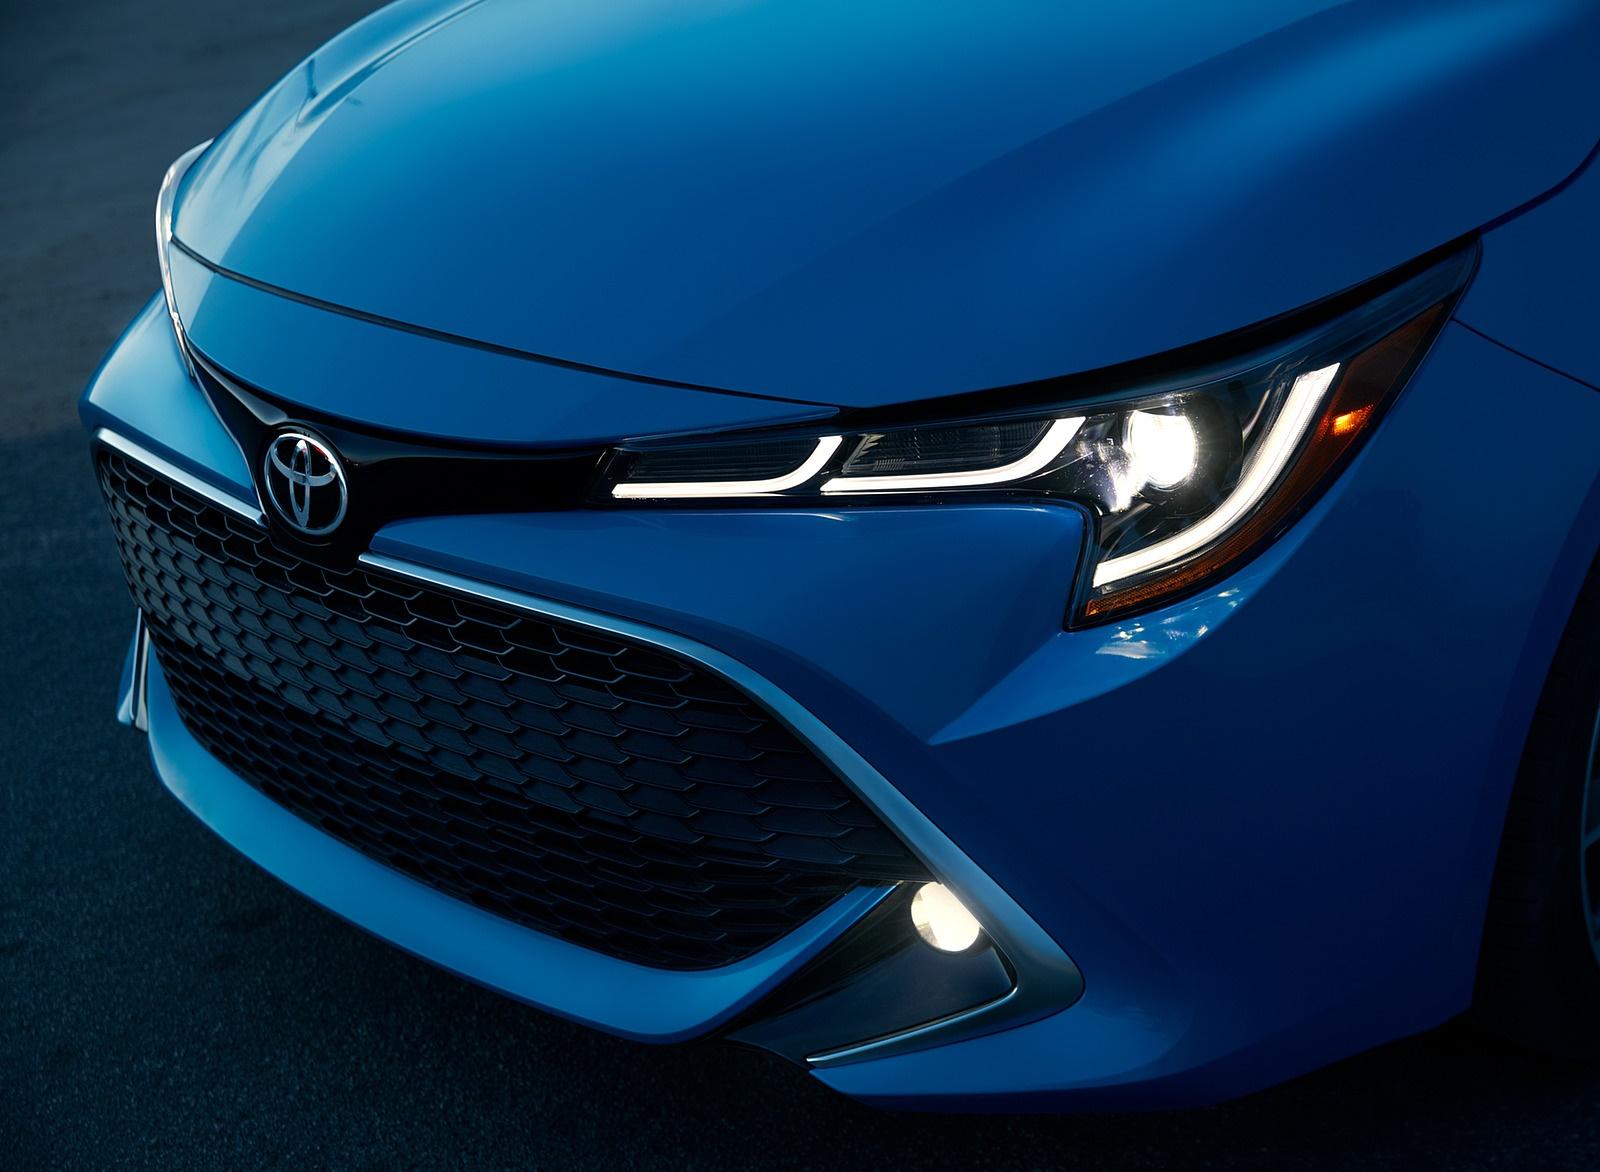 2019 Toyota Corolla Hatchback Headlight Wallpaper (11)